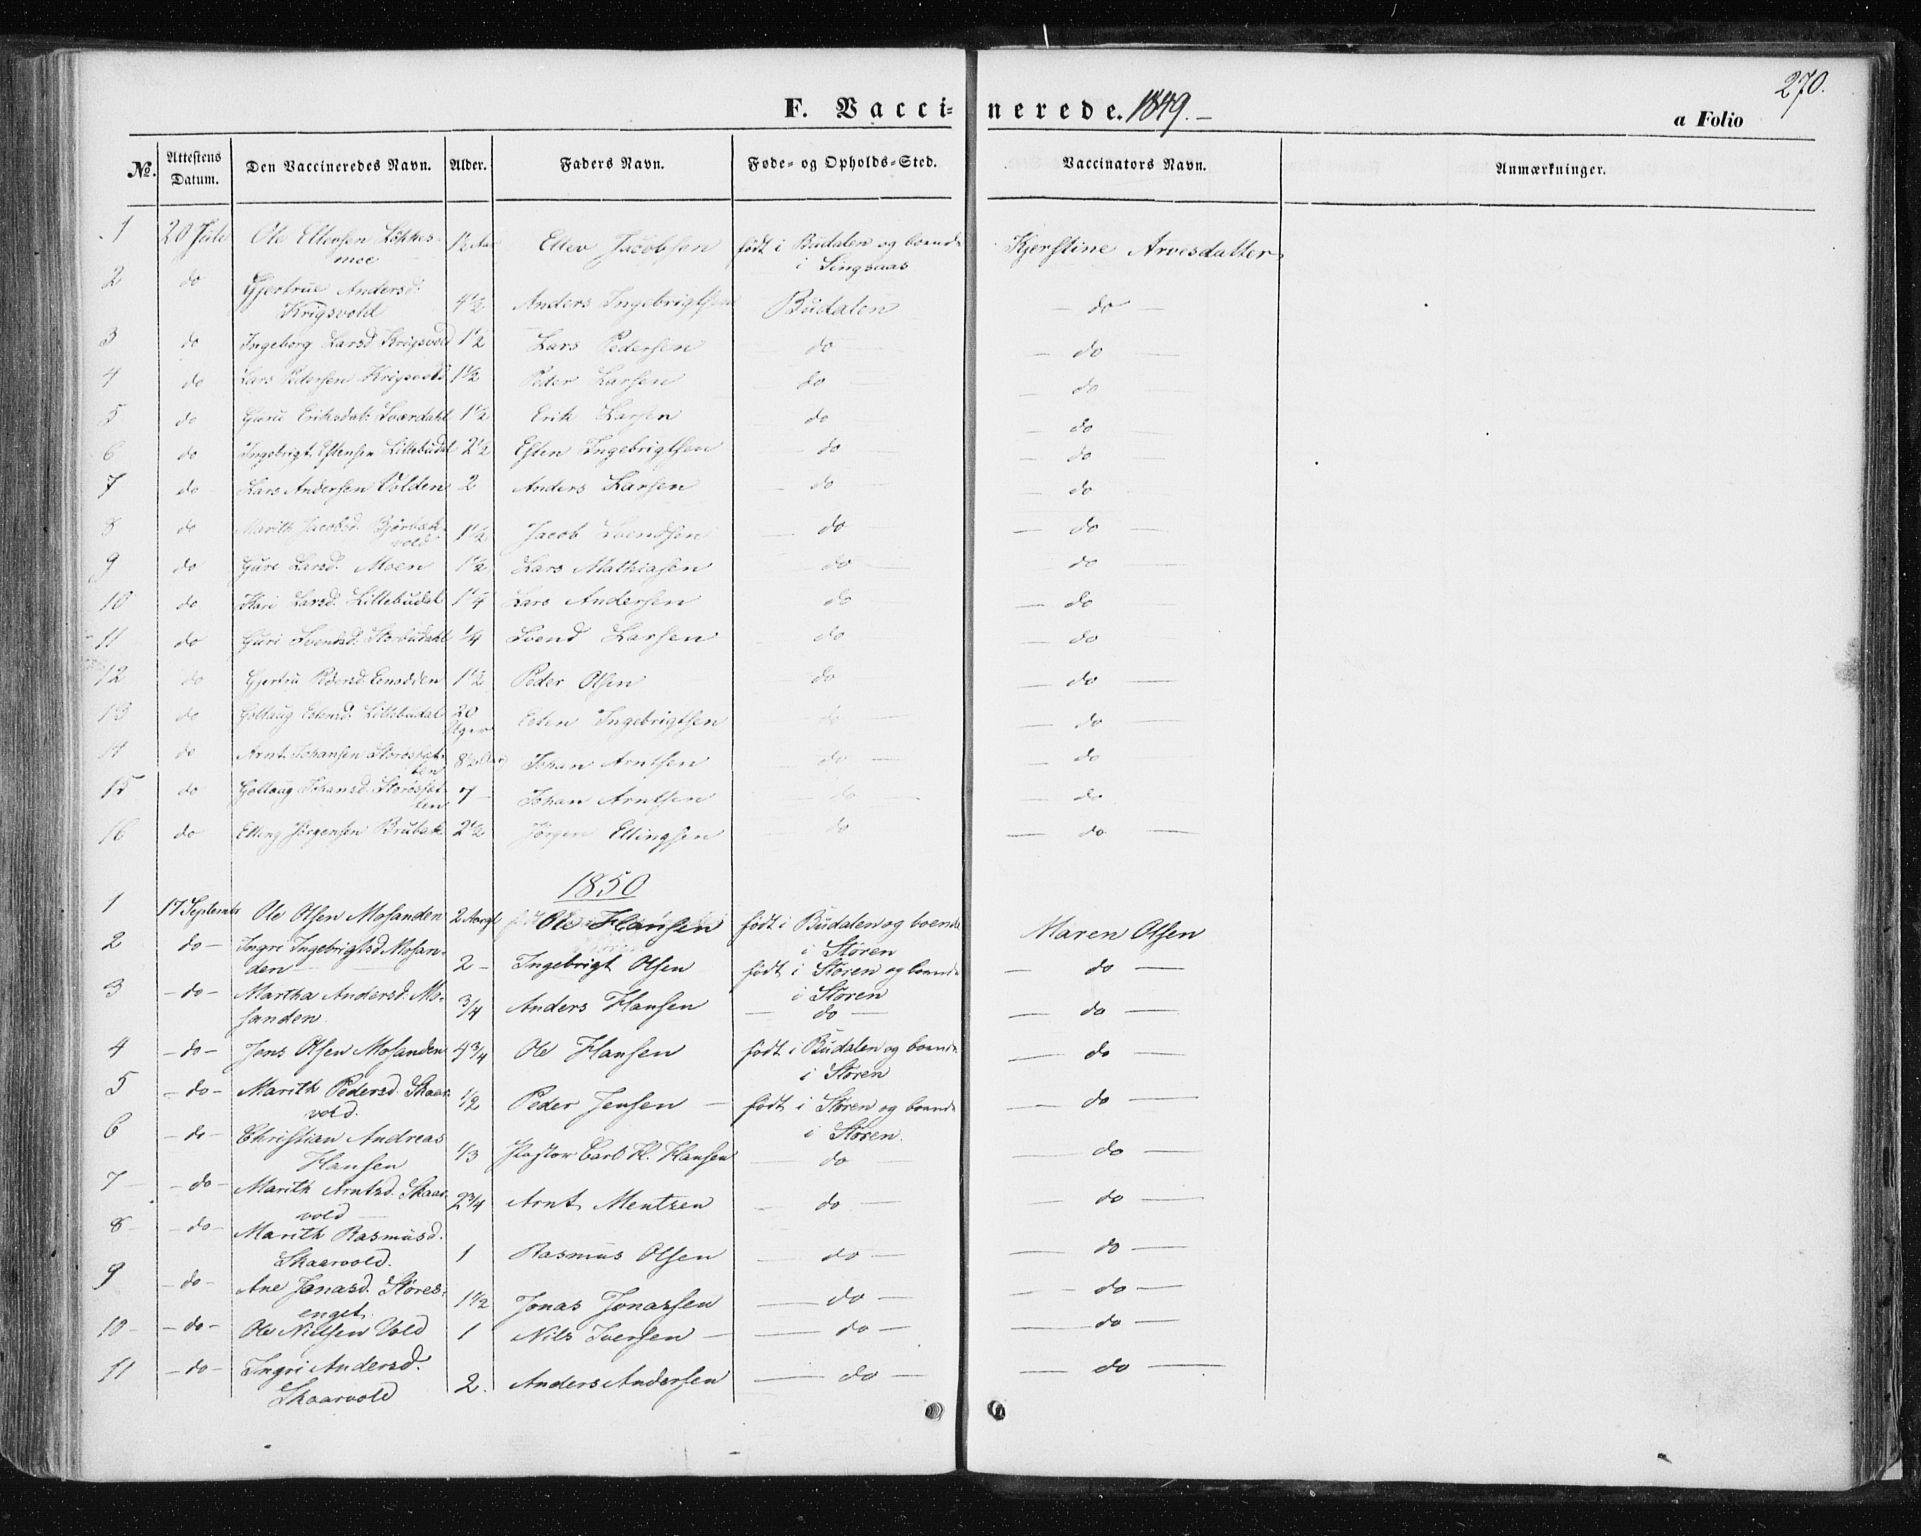 SAT, Ministerialprotokoller, klokkerbøker og fødselsregistre - Sør-Trøndelag, 687/L1000: Parish register (official) no. 687A06, 1848-1869, p. 270